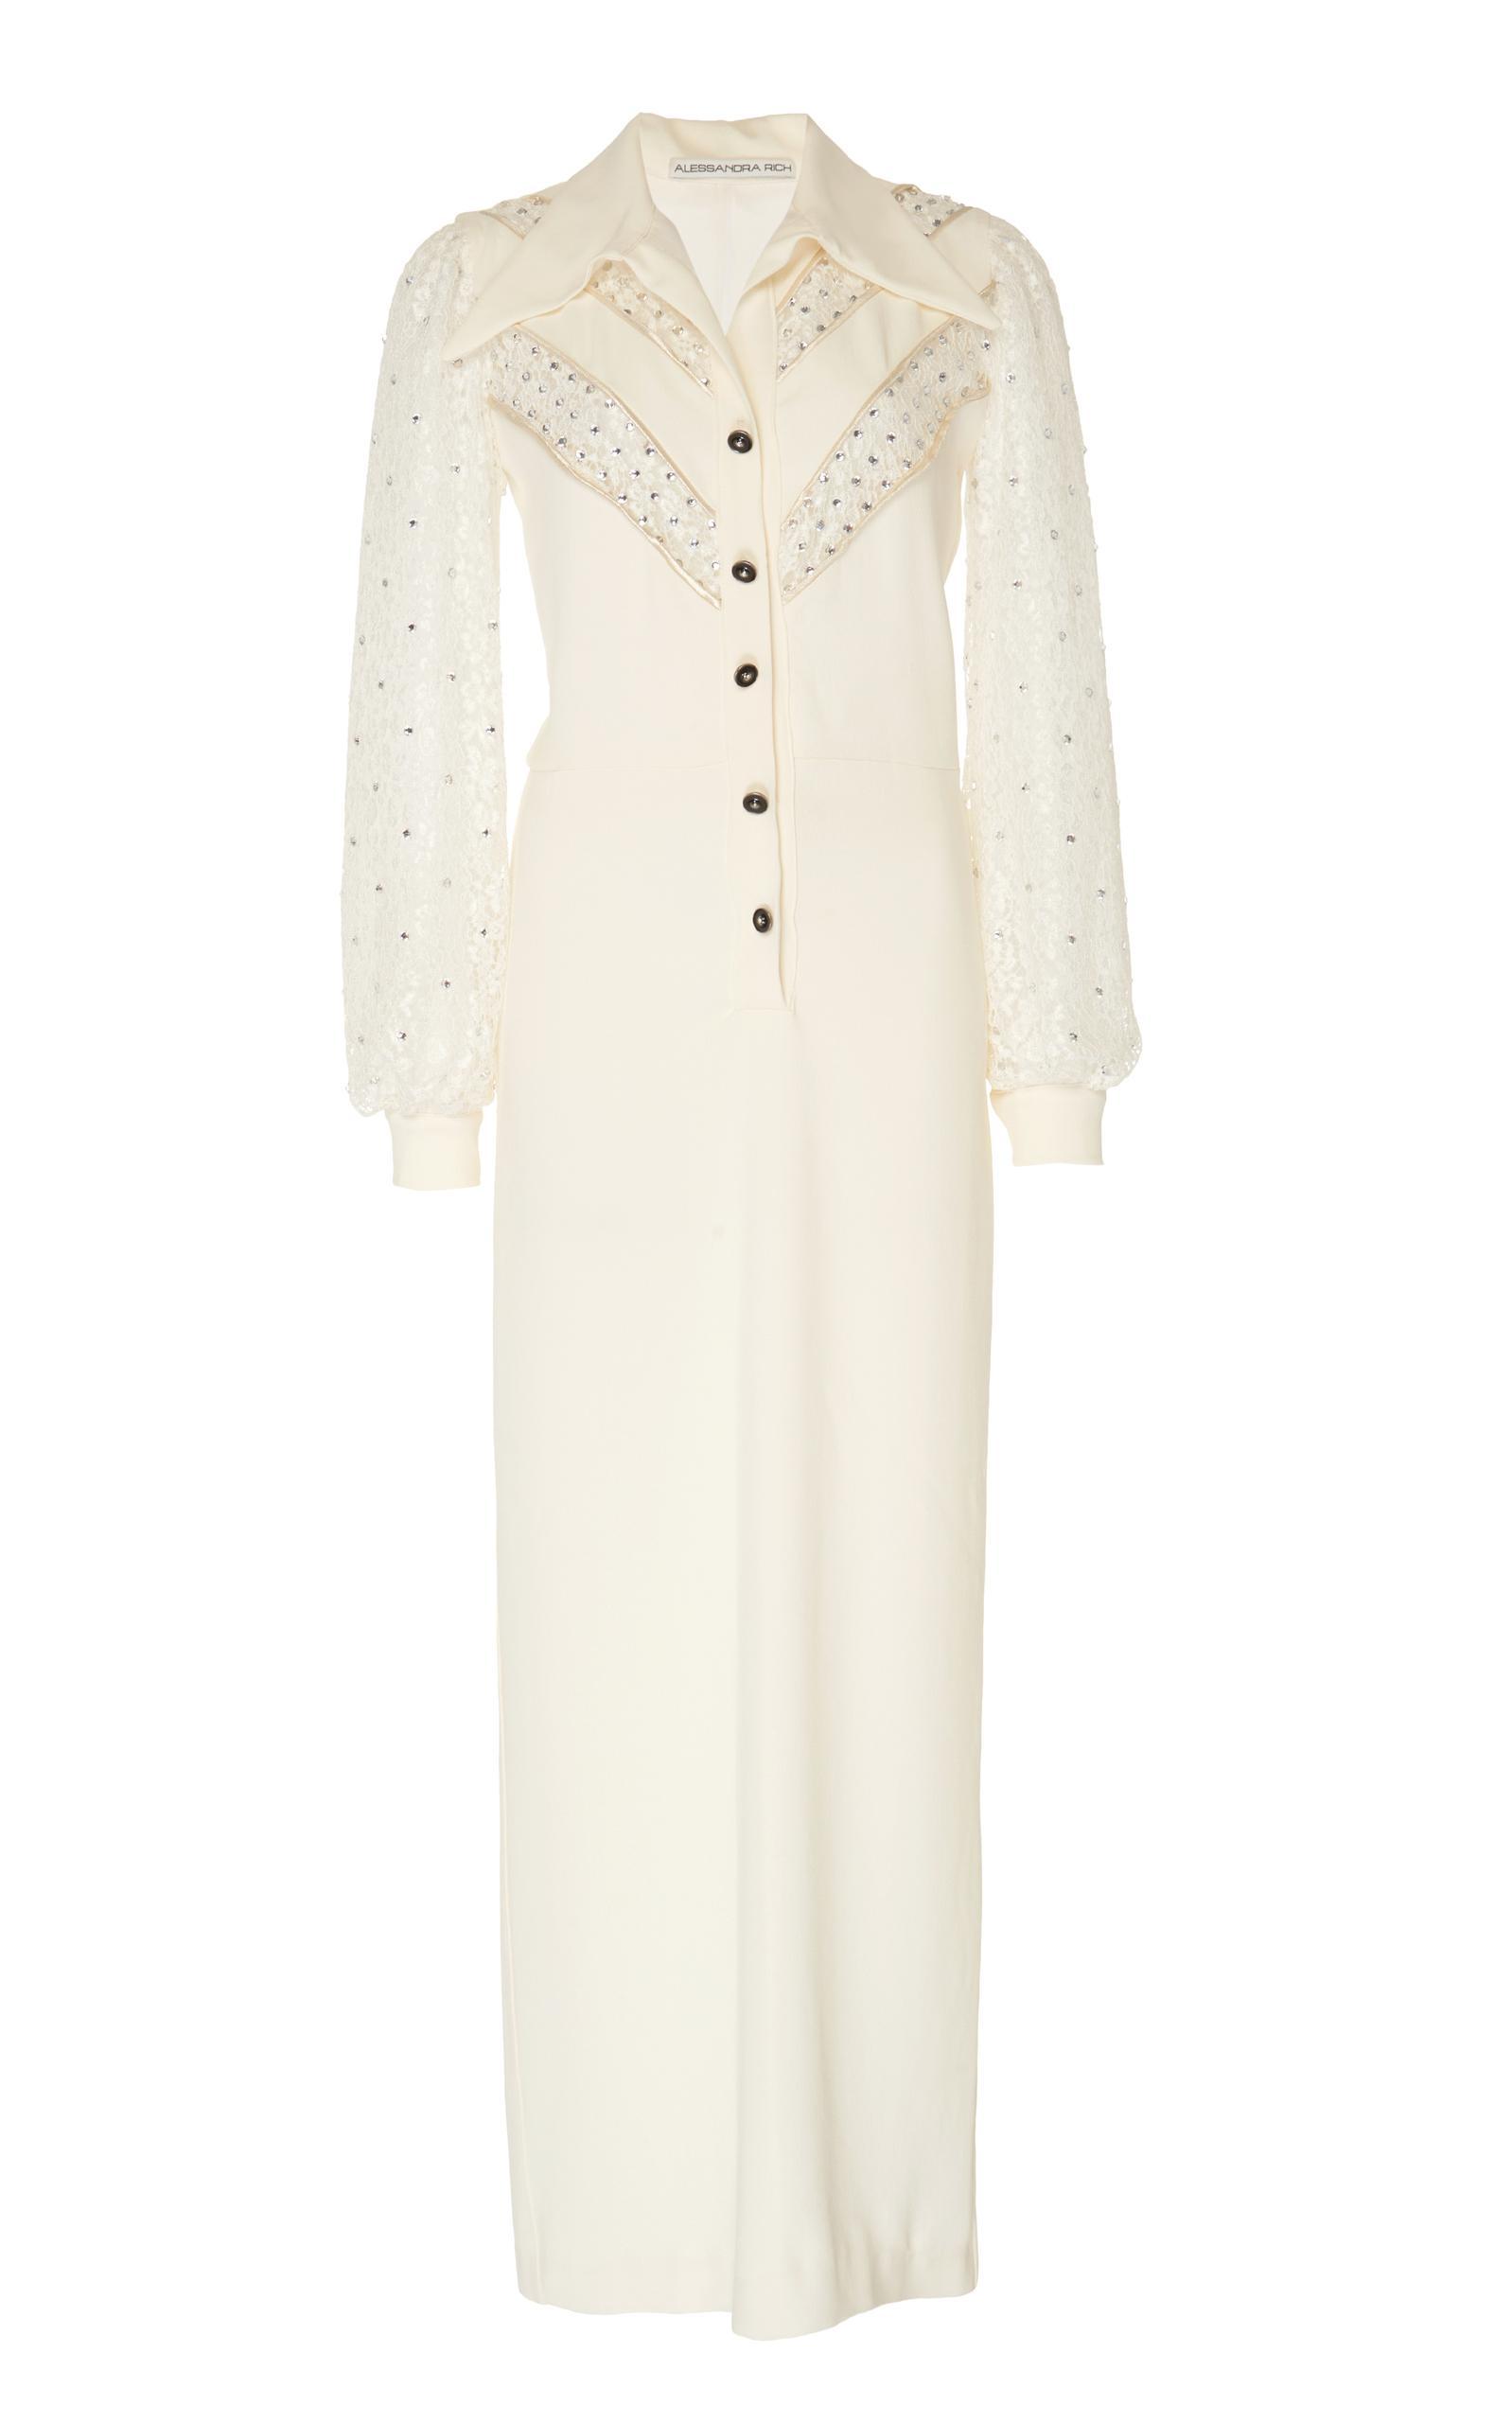 Alessandra Rich Embellished SablÉ Midi Dress In White